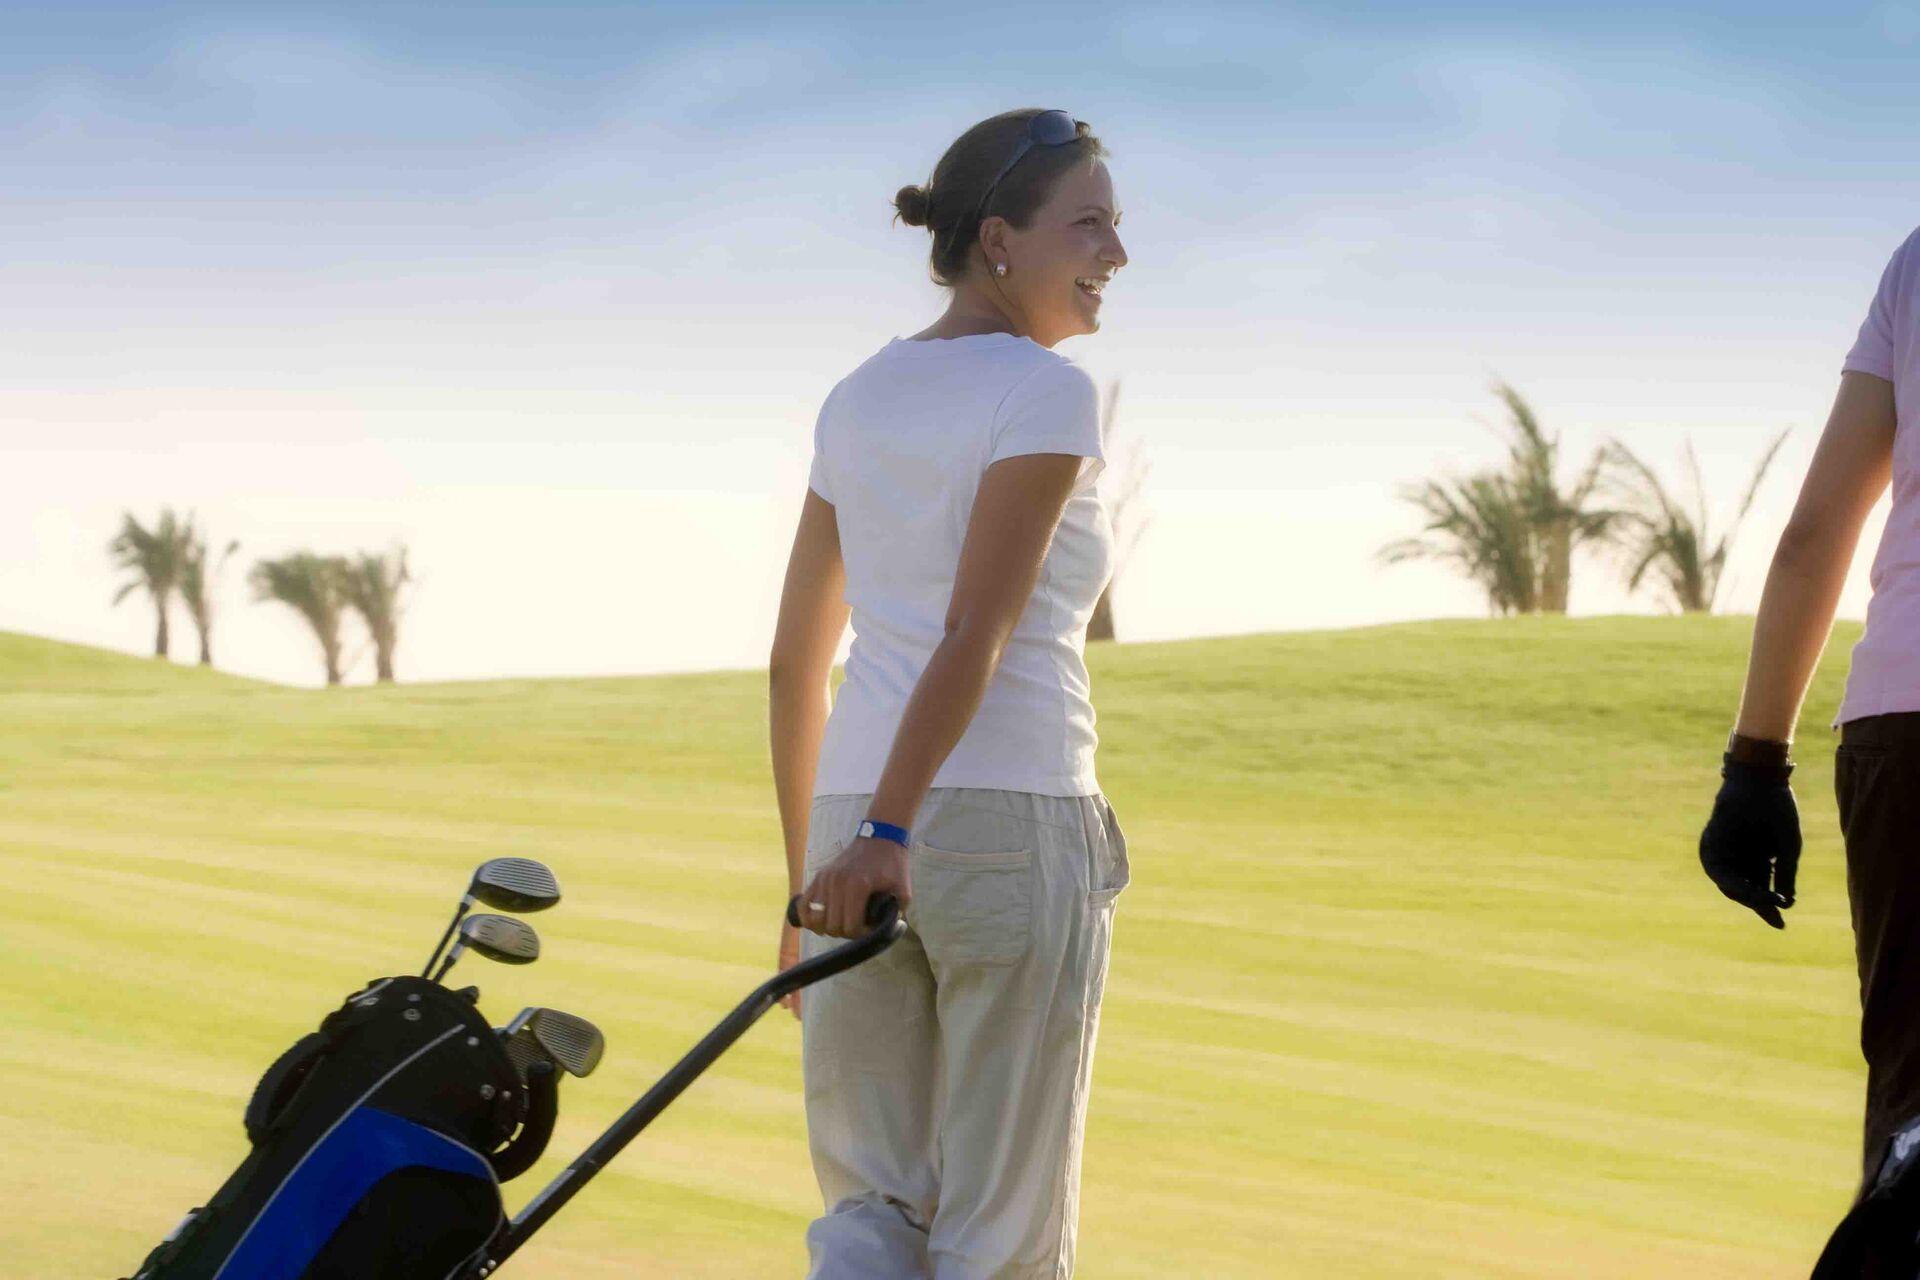 https://cms.satur.sk/data/imgs/tour_image/orig/golf-course-1947530.jpg